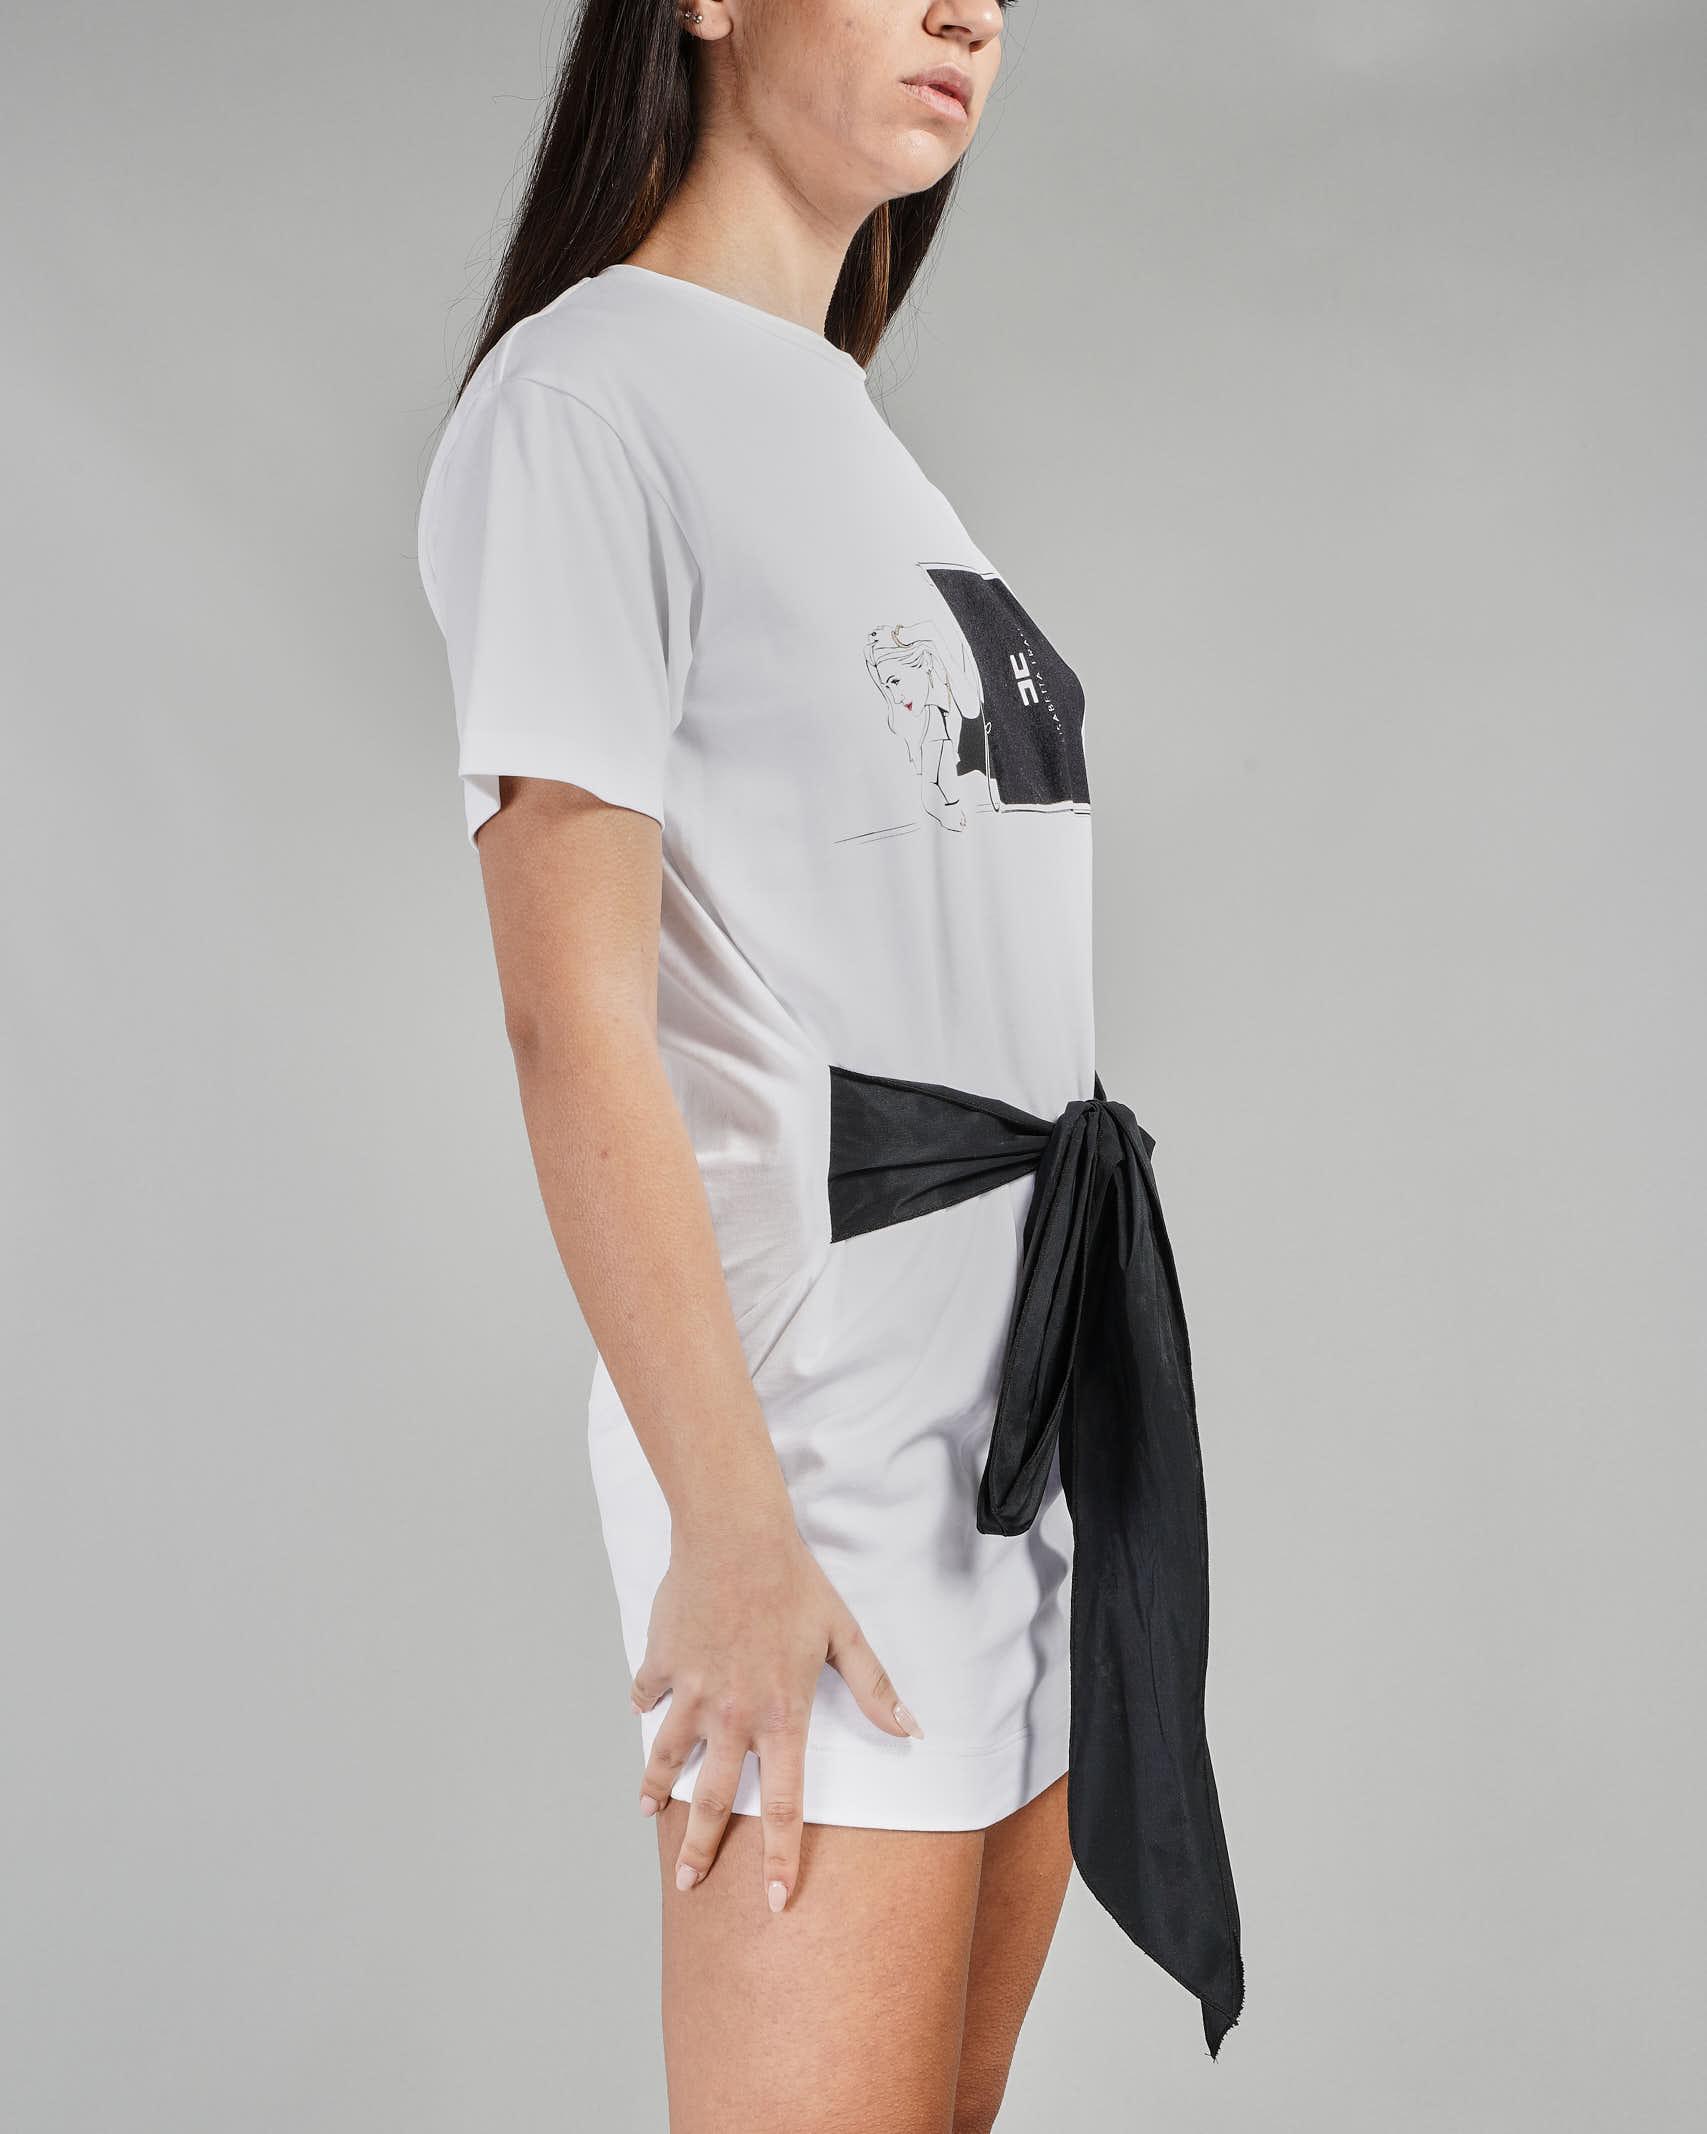 T-shirt lunga con stampa shopper e fiocco Elisabetta Franchi ELISABETTA FRANCHI | T-shirt | MA18911E2270